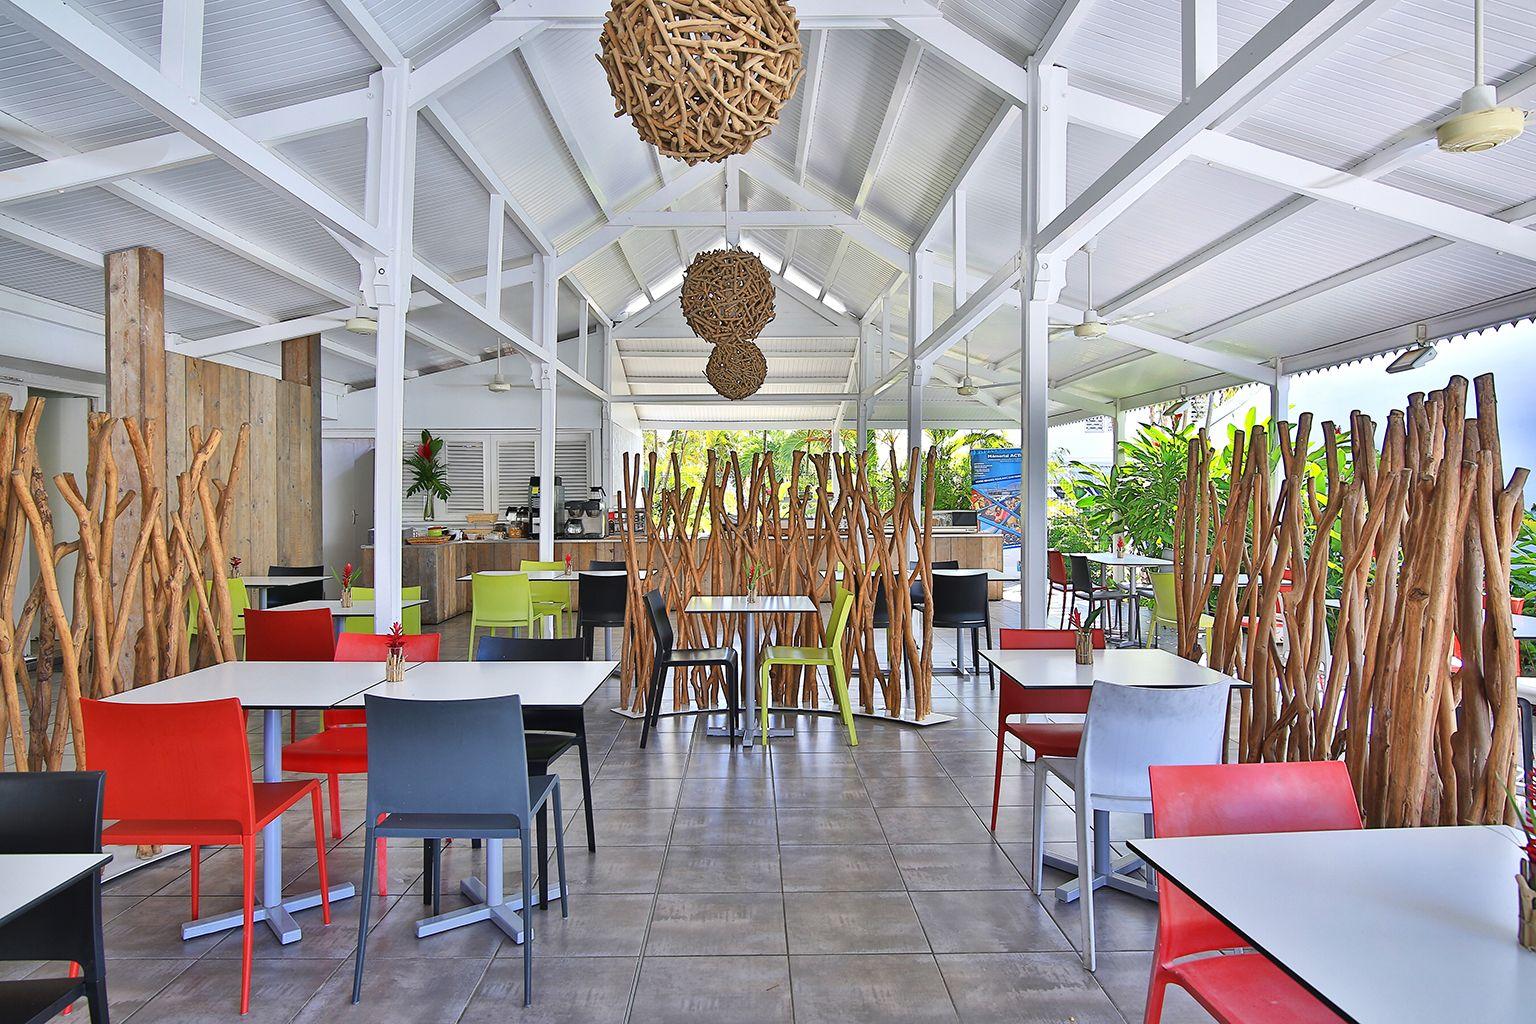 15+ Bwa chik hotel golf ideas in 2021